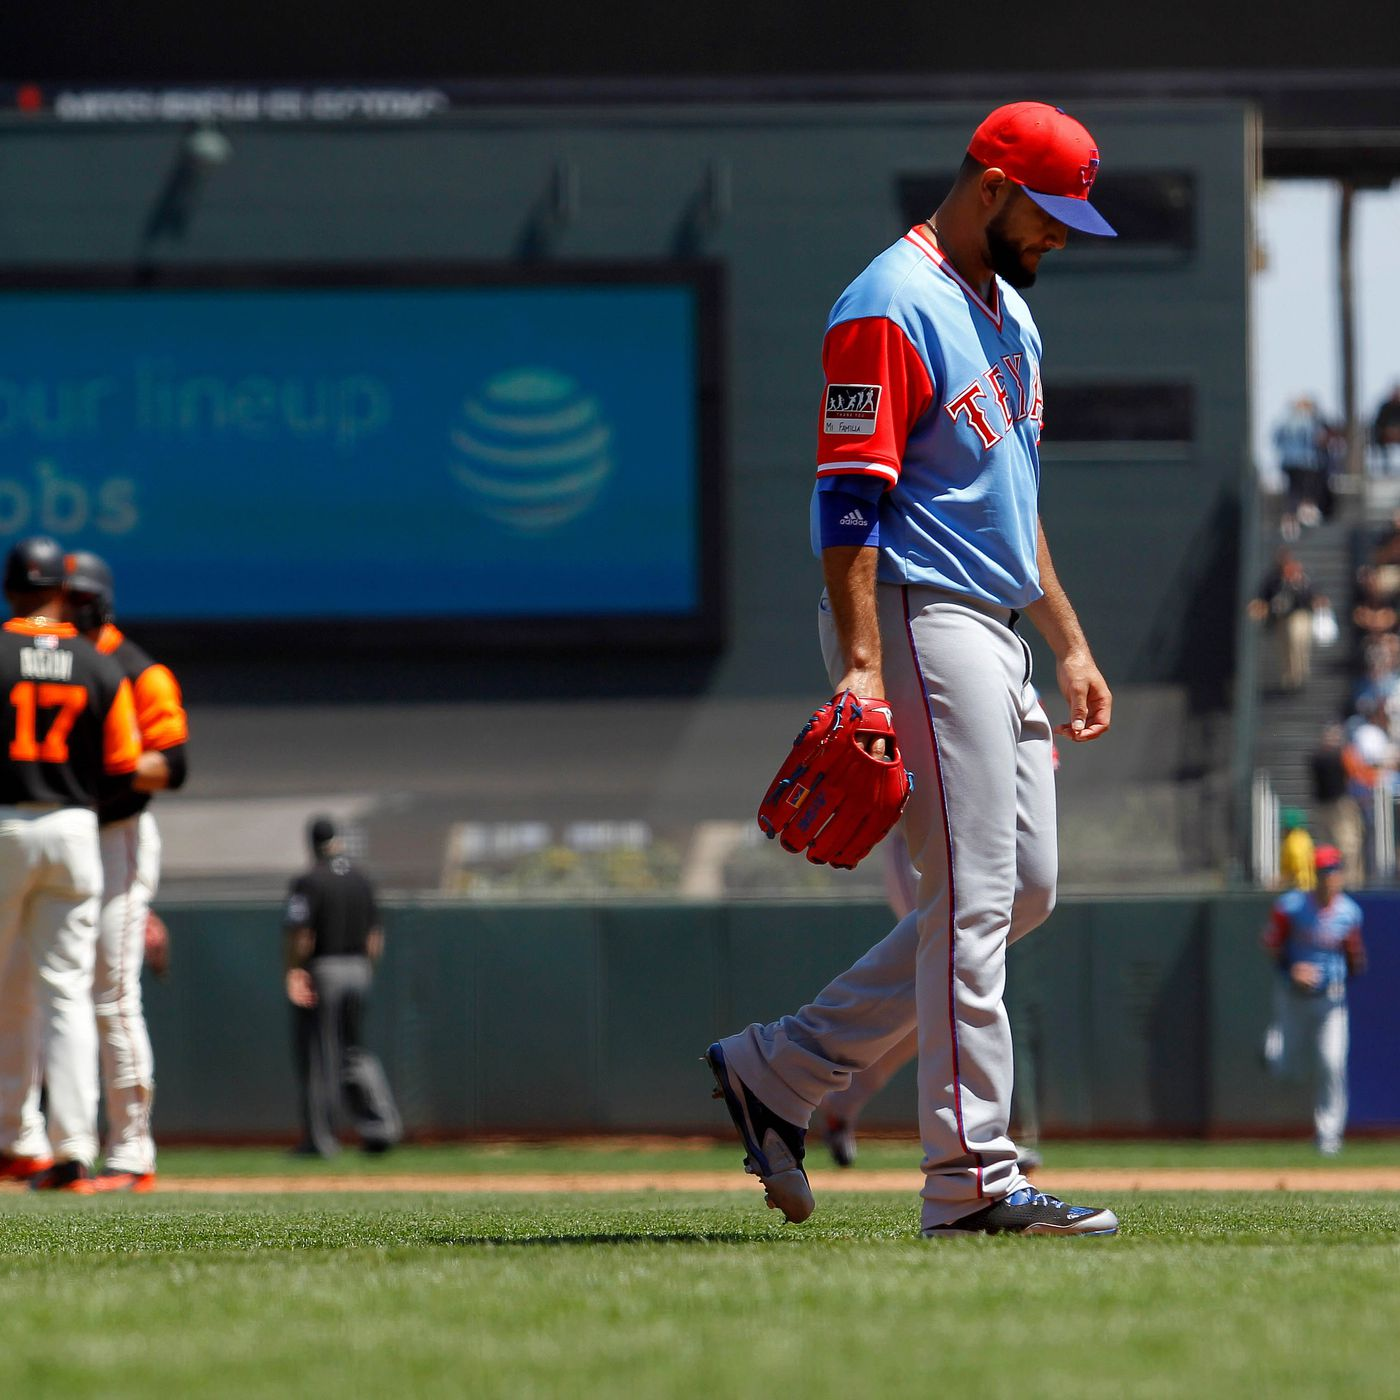 Big Inning Dooms El De Las Matas Perez As Rangers Fall In San